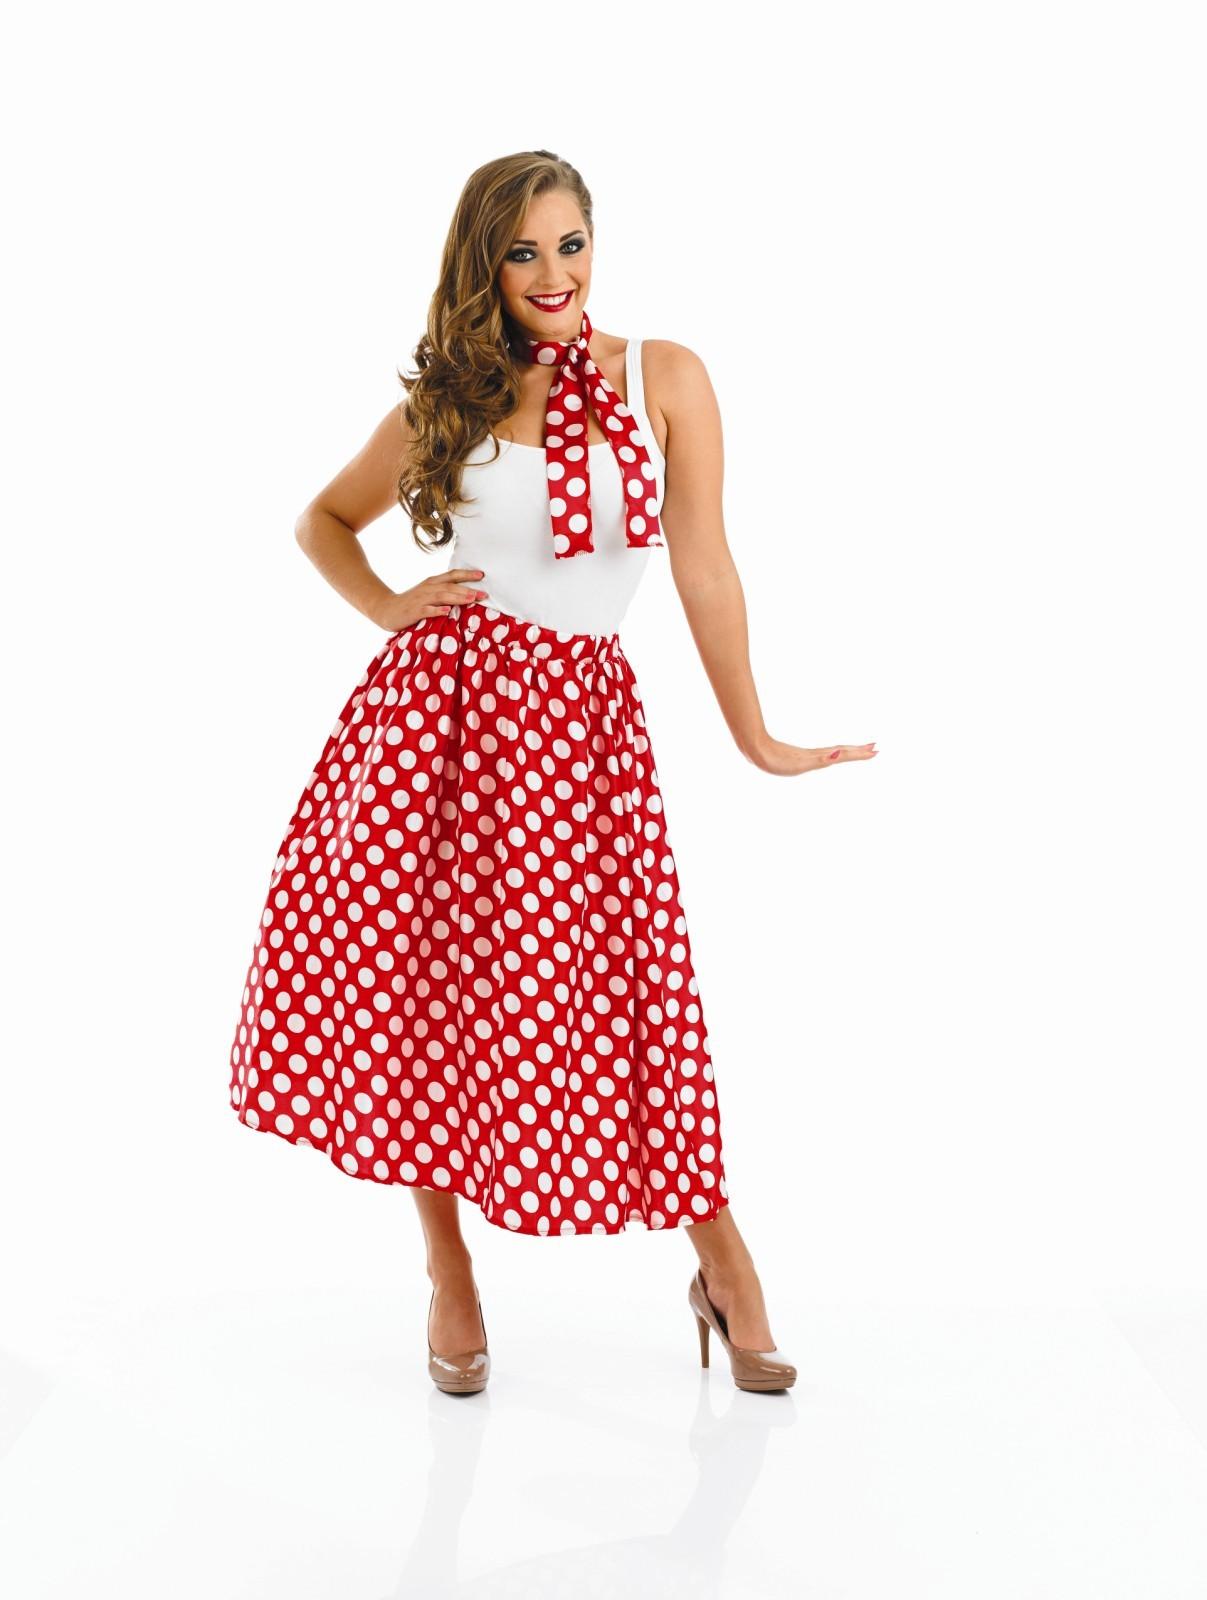 Ladies 1950s Rock N Roll Skirt Costume For 50s Fancy Dress Adults Womens | eBay